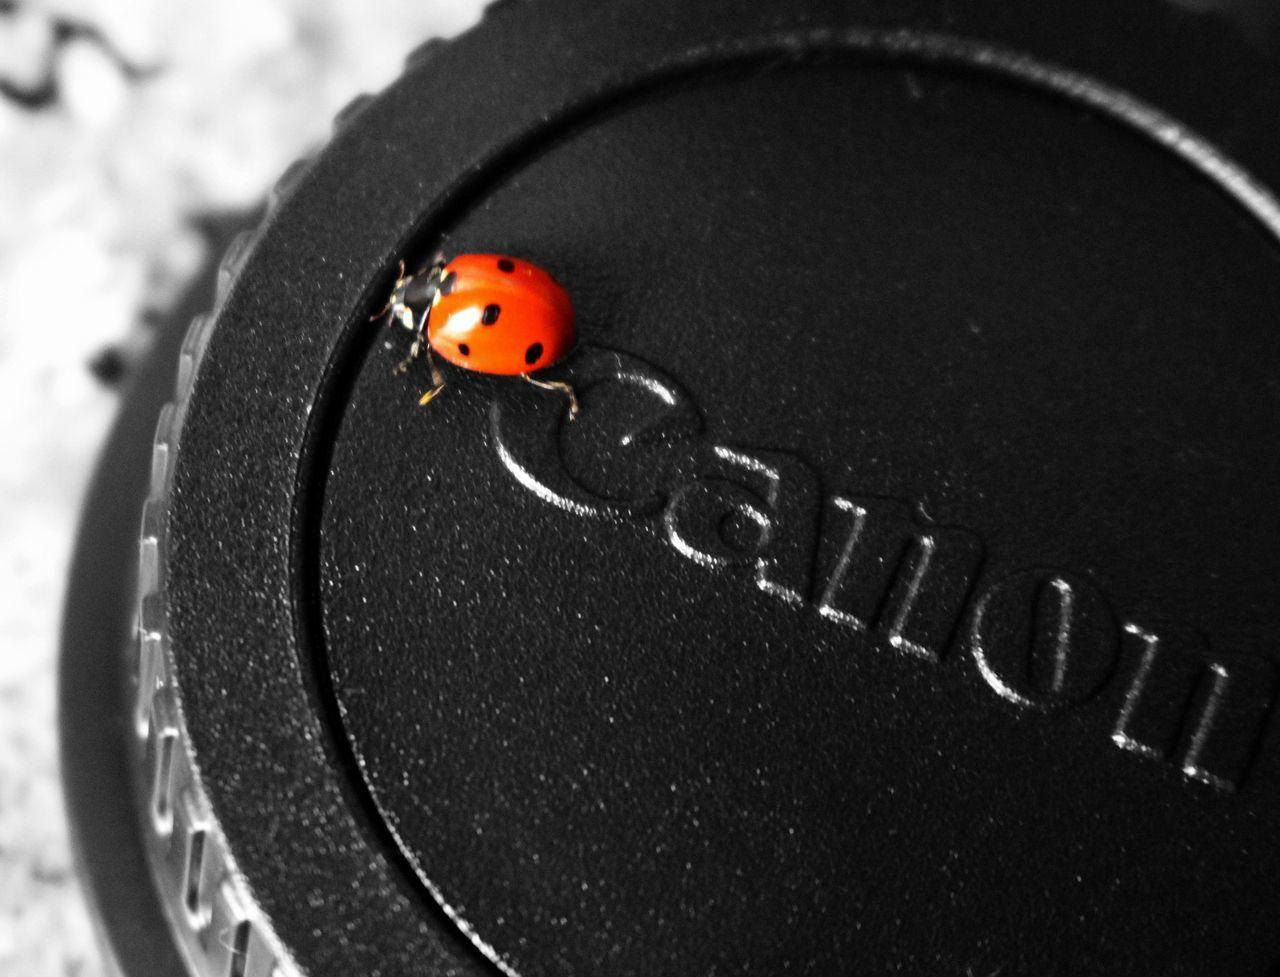 no people, close-up, ladybug, animal themes, day, outdoors